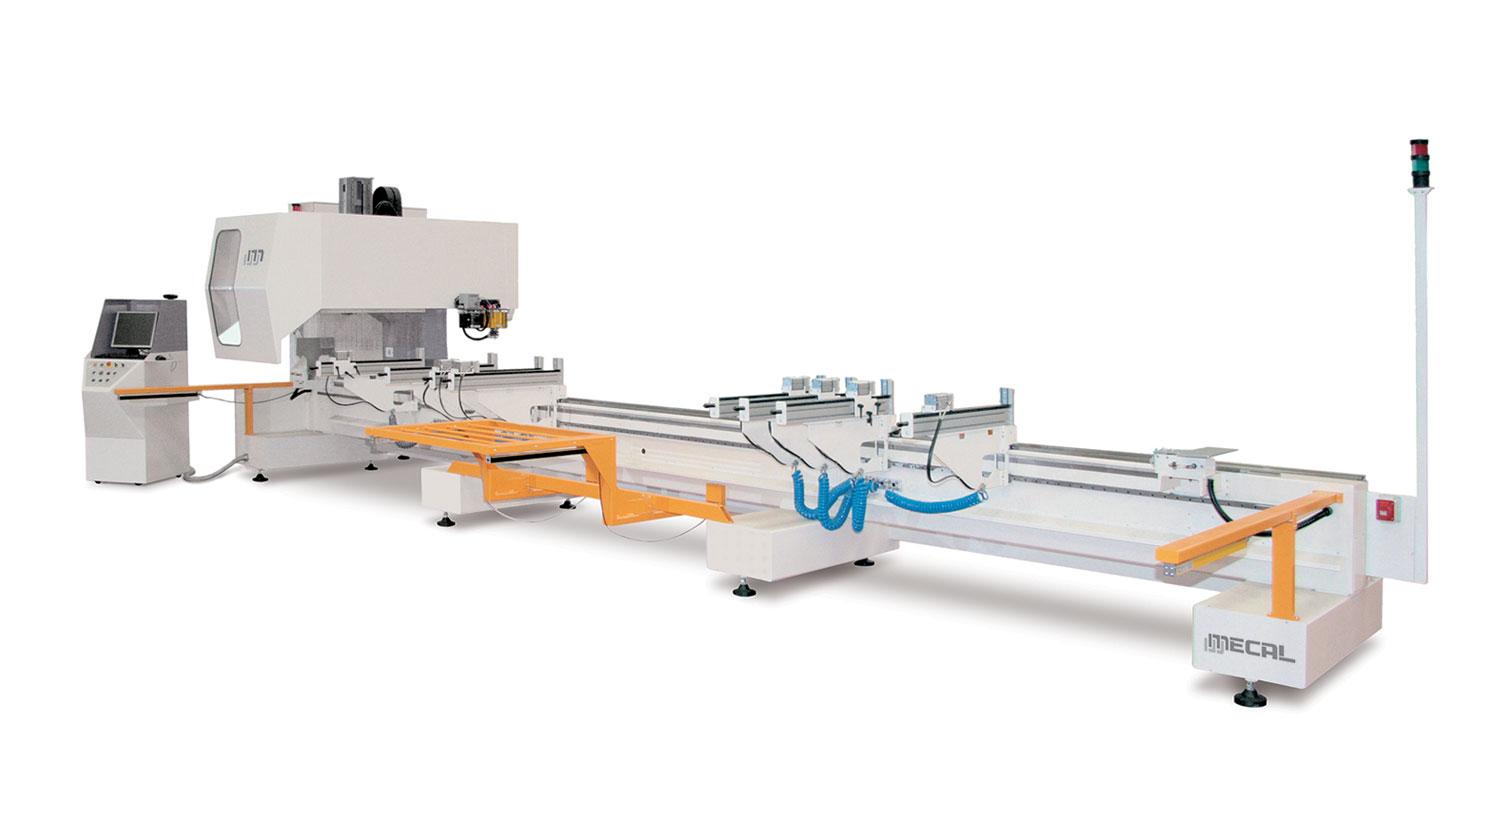 INT aluminum CNC Mecal Atlas 1